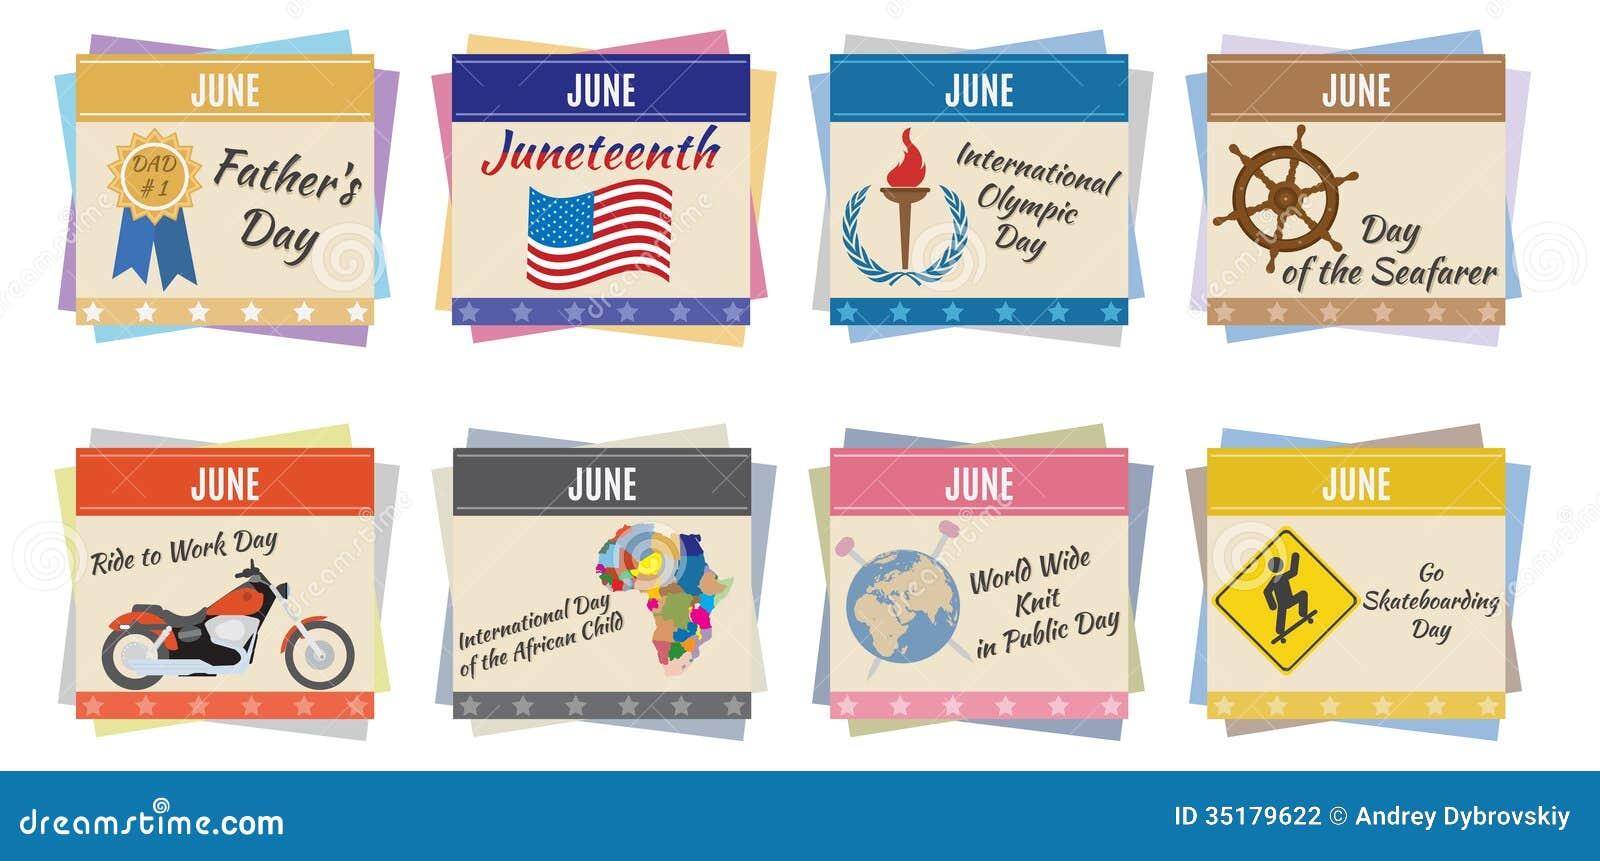 june 2016 holidays printable calendar 2016 free